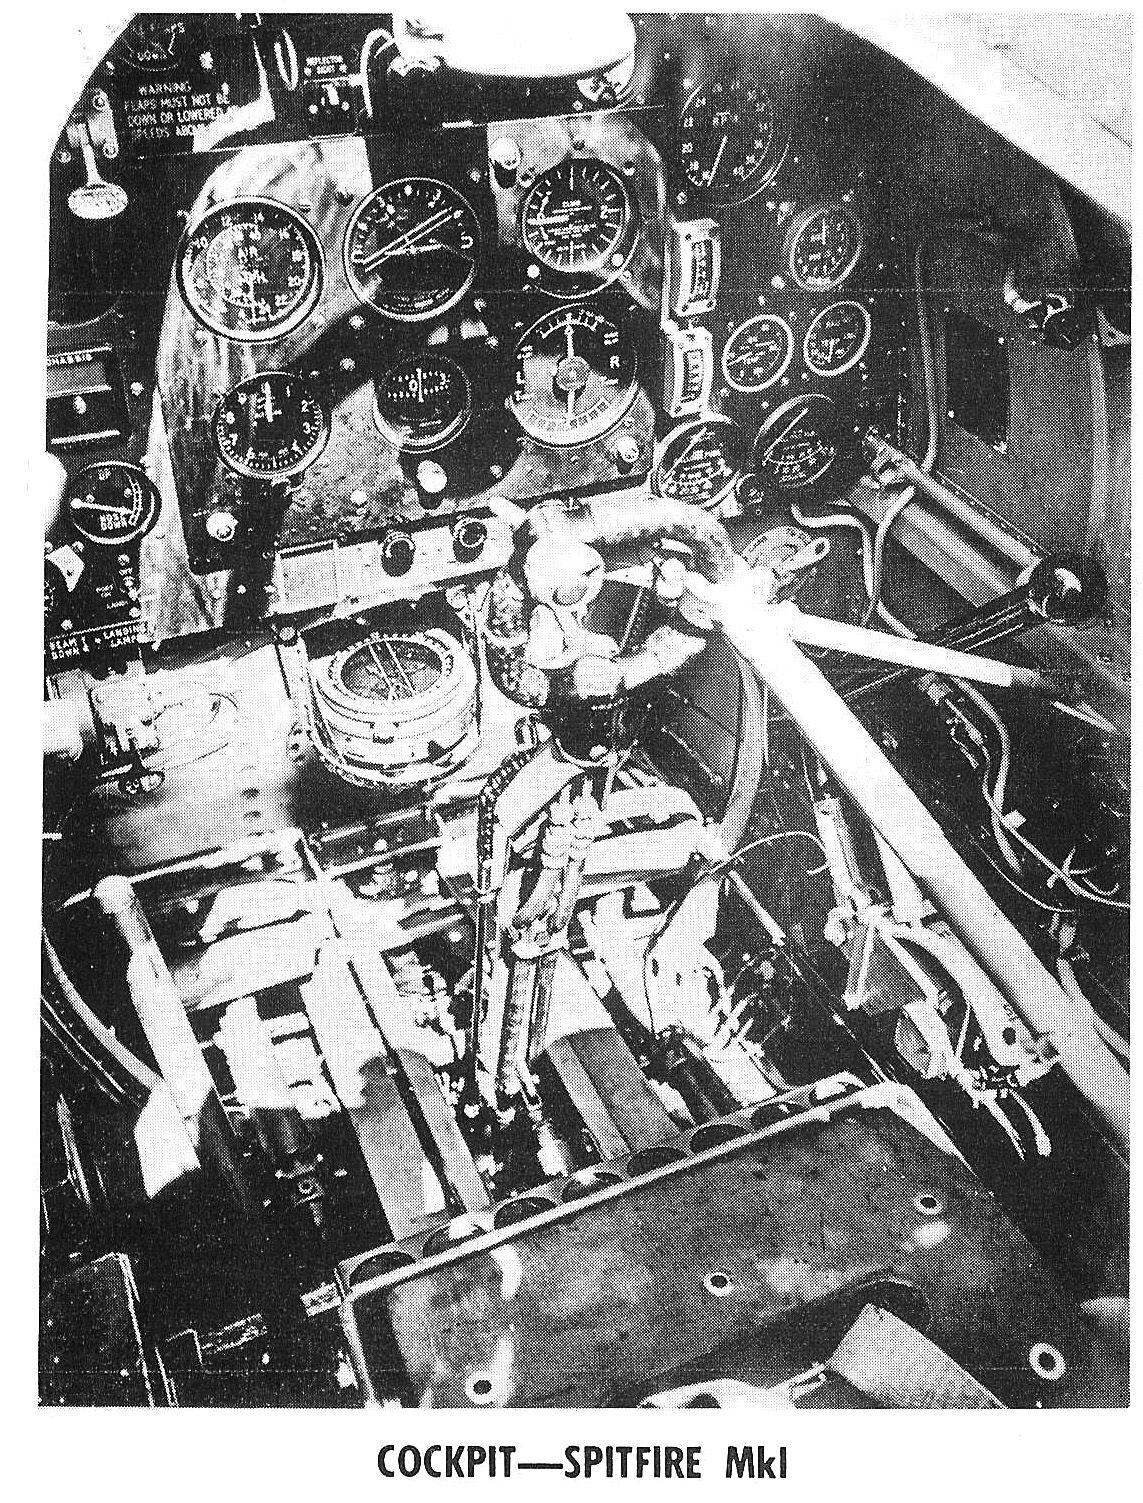 spifire_cockpit_photo1.jpg